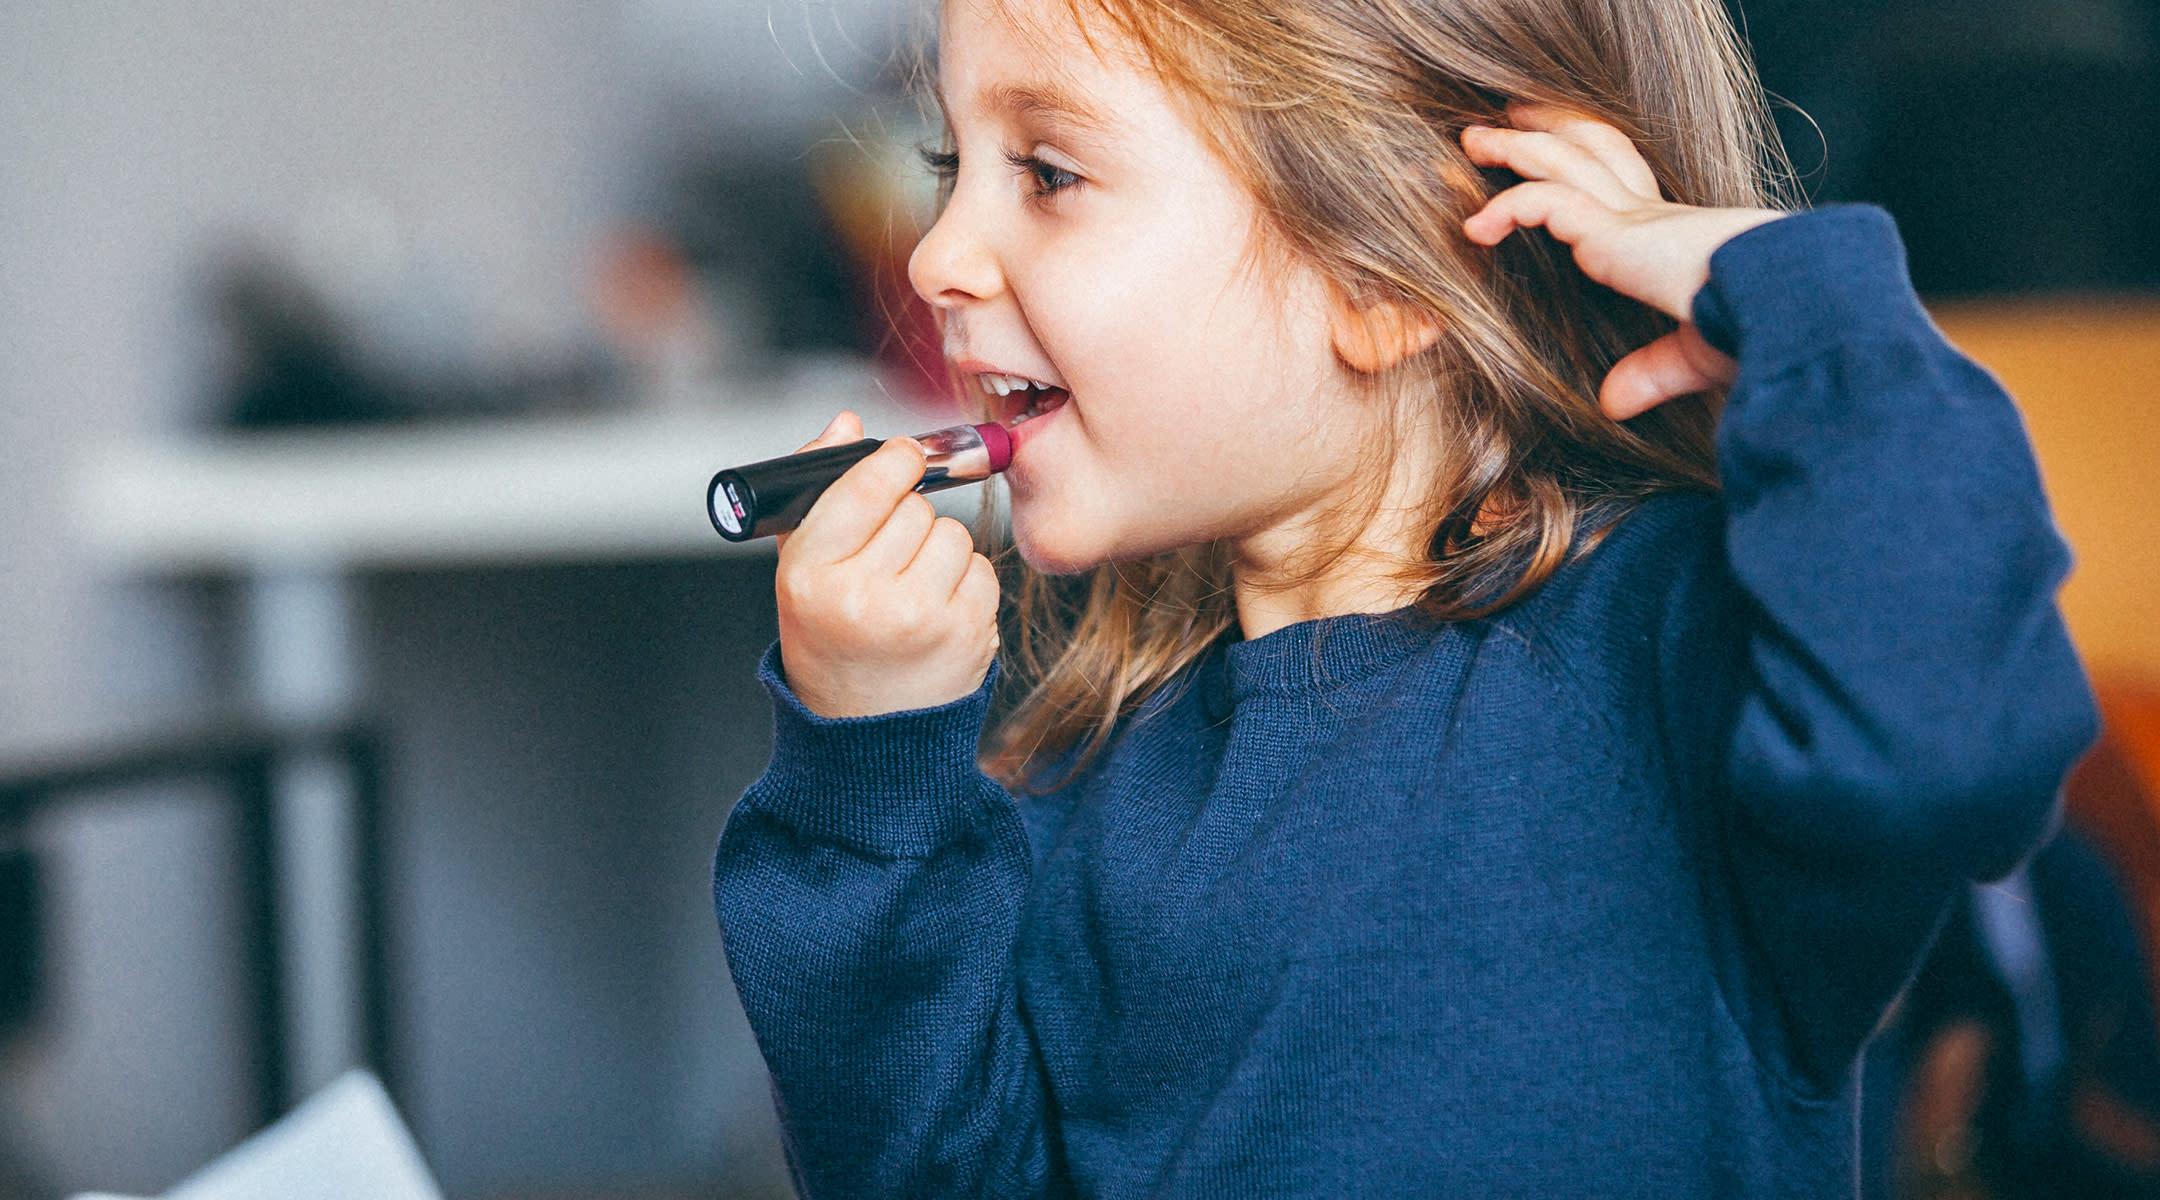 toddler girl putting on lipstick